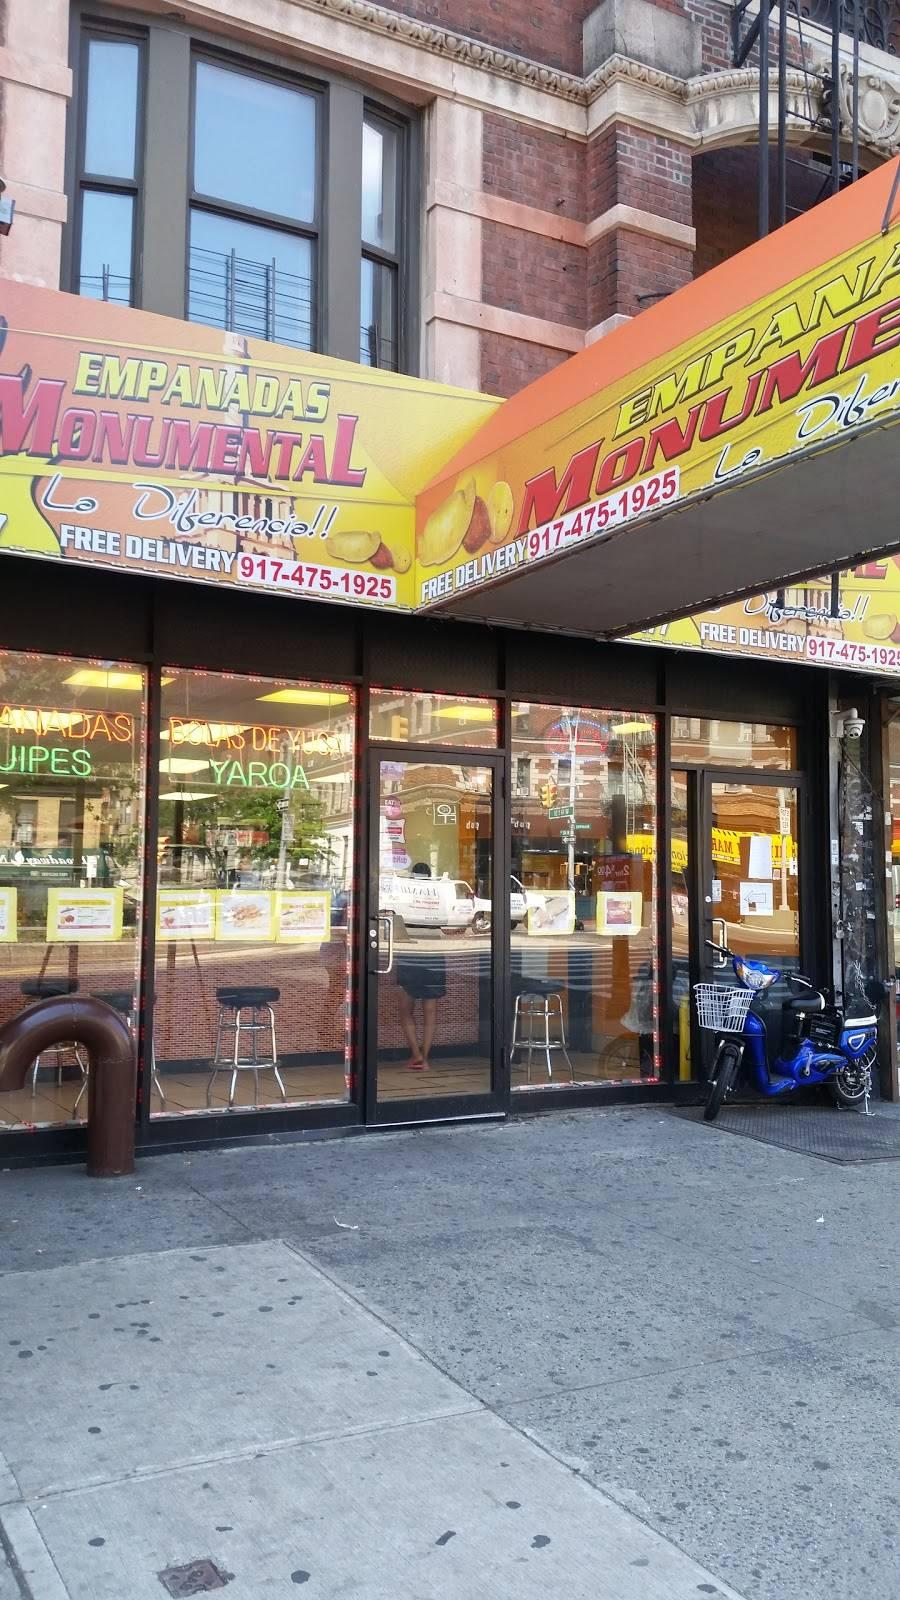 Empanadas Monumental | restaurant | 3477 Broadway, New York, NY 10031, USA | 9174751925 OR +1 917-475-1925